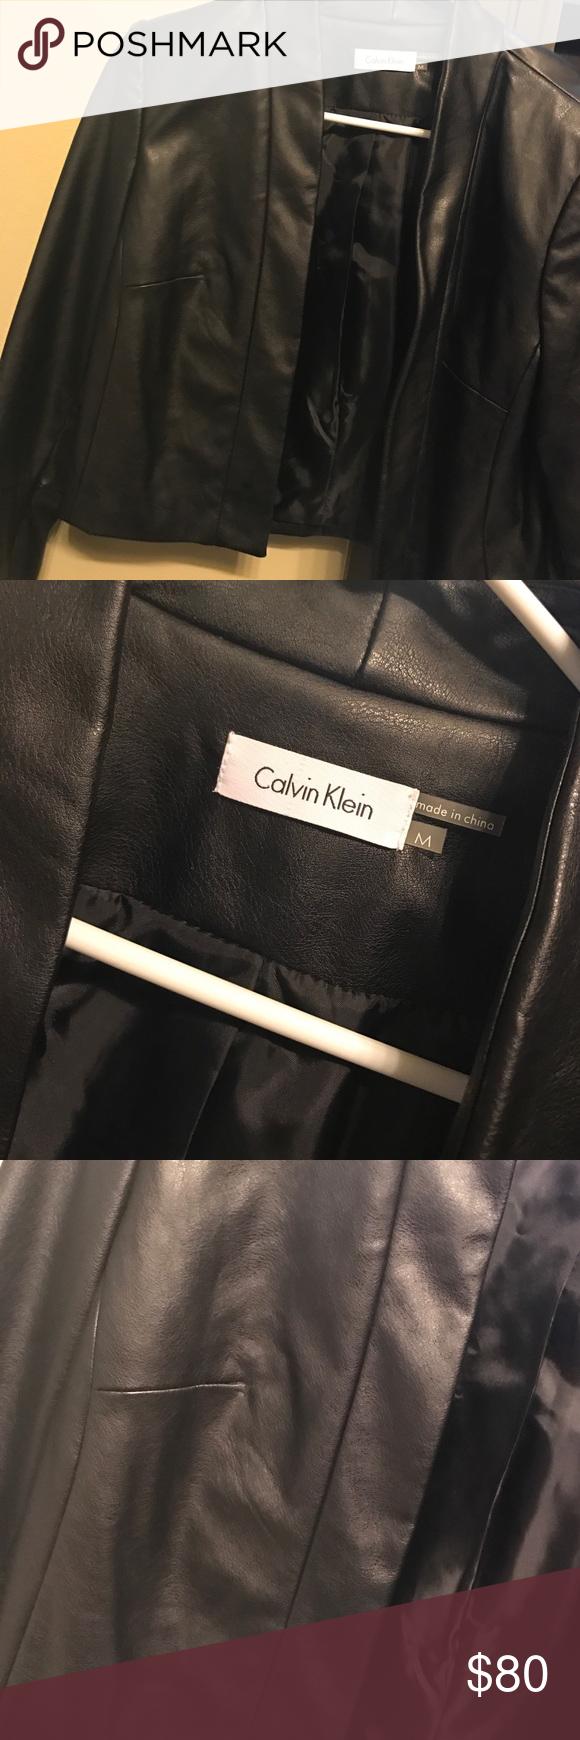 Calvin Klein Leather Jacket Fake Leather Nwot Calvin Klein Jackets Coats Calvin Leather Calvin Klein